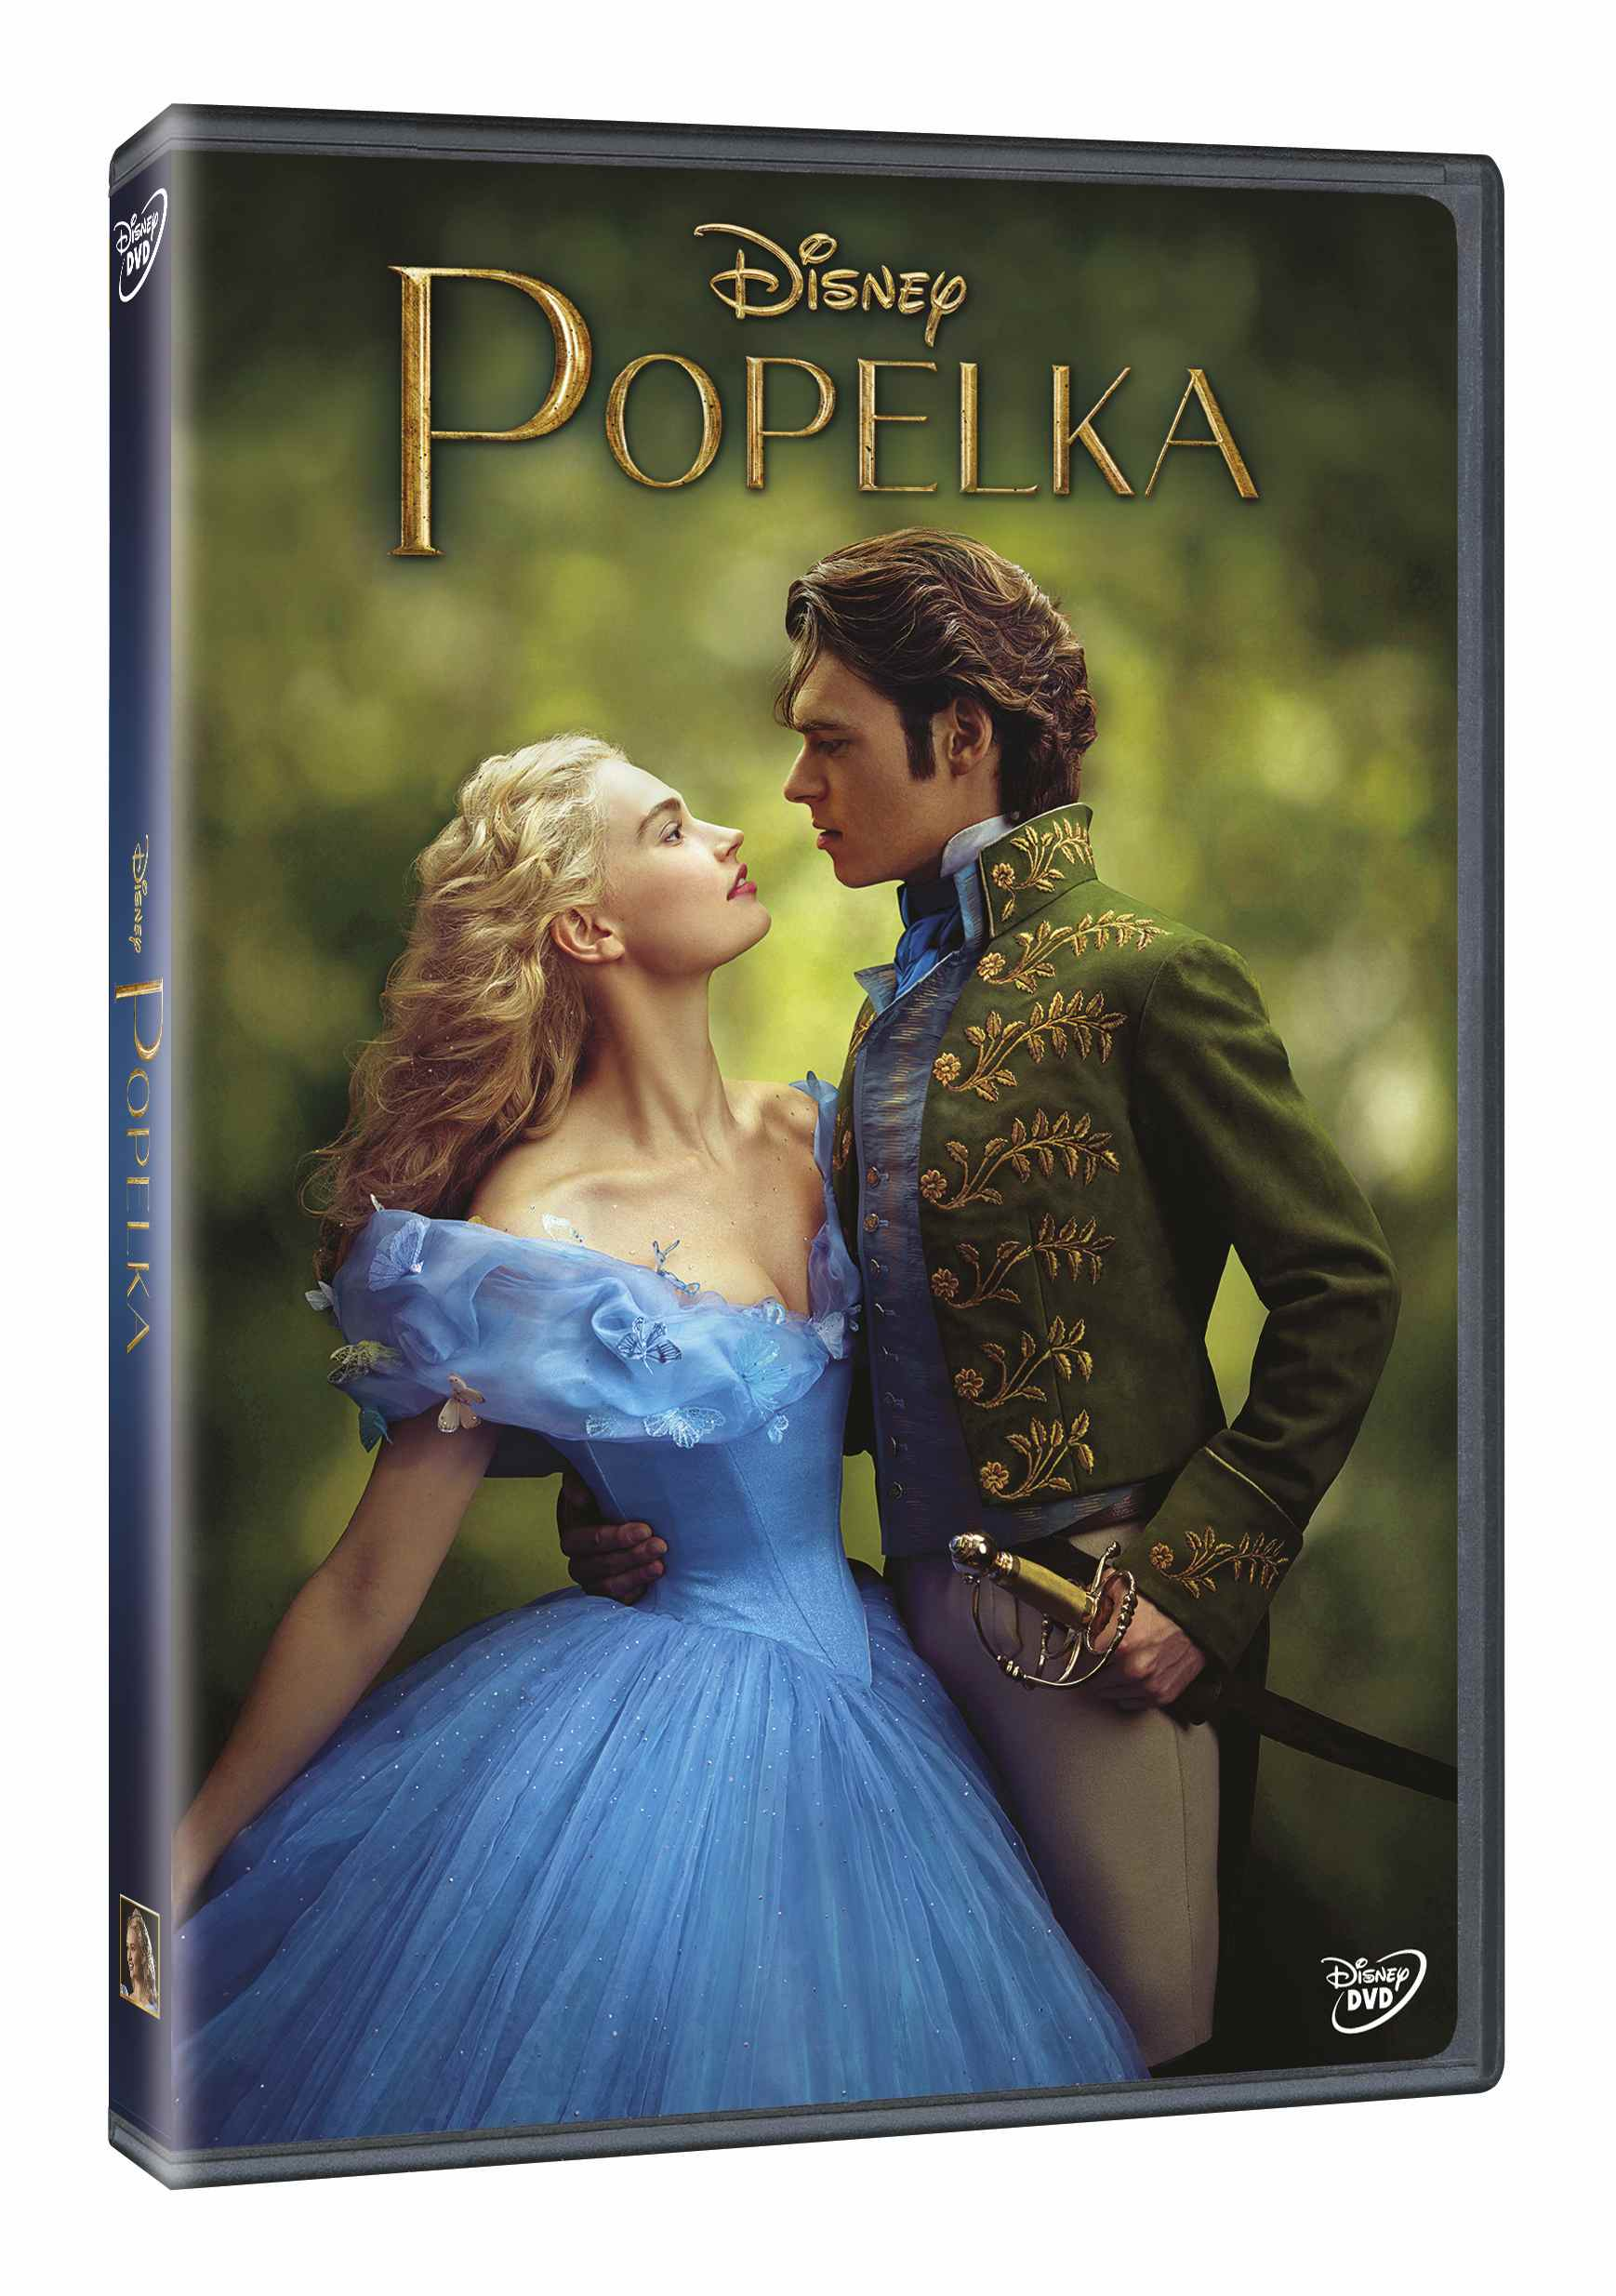 POPELKA (2015) - DVD